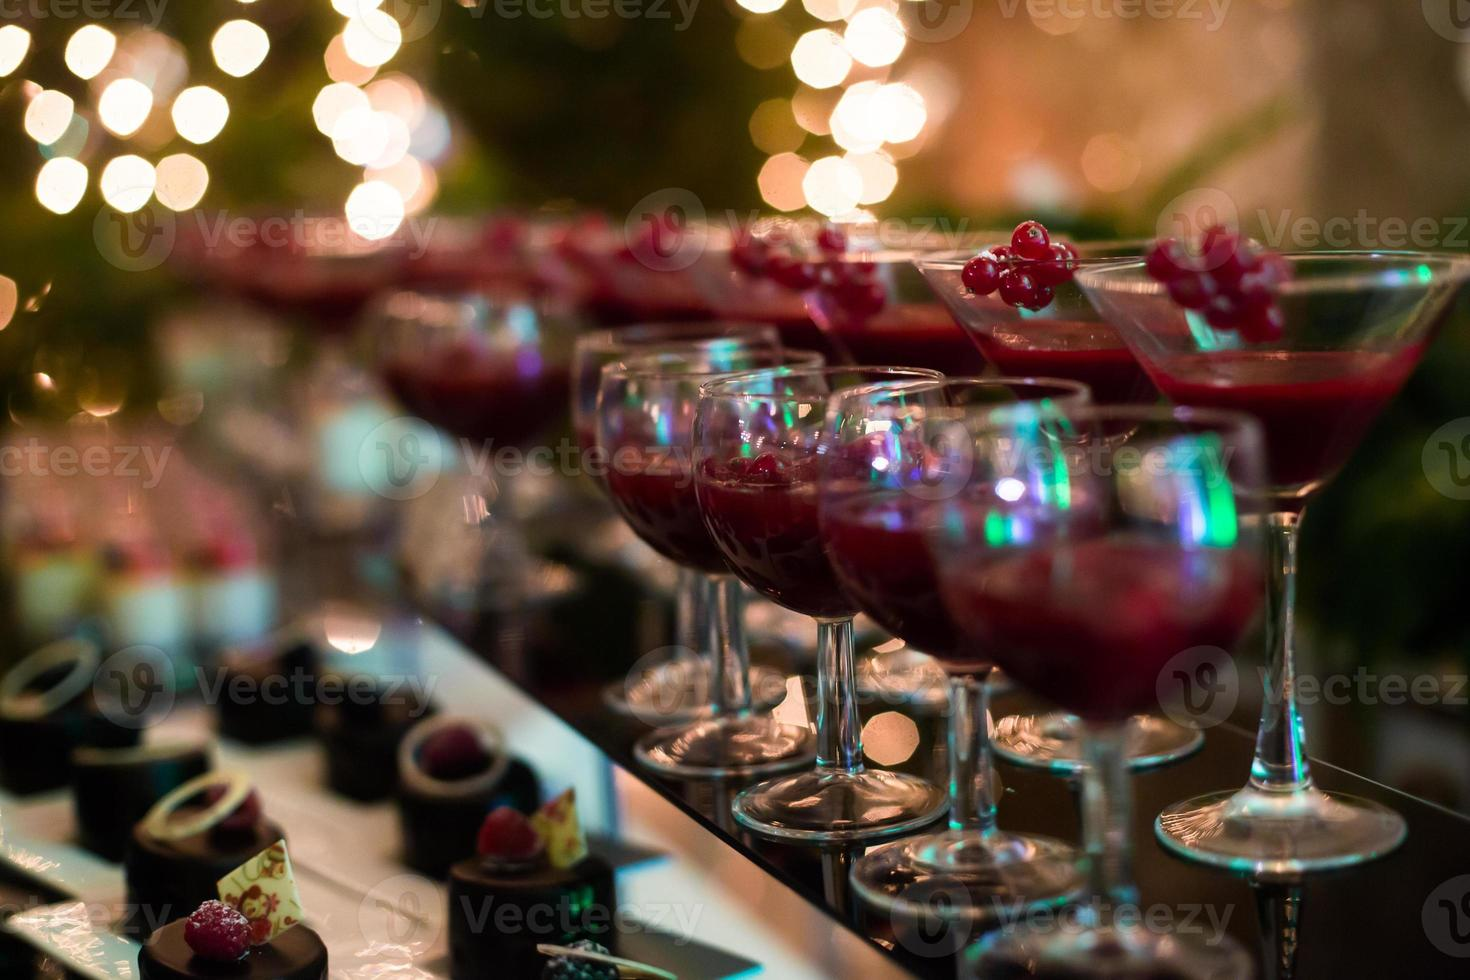 línea de cócteles de alcohol de diferentes colores en una fiesta al aire libre foto